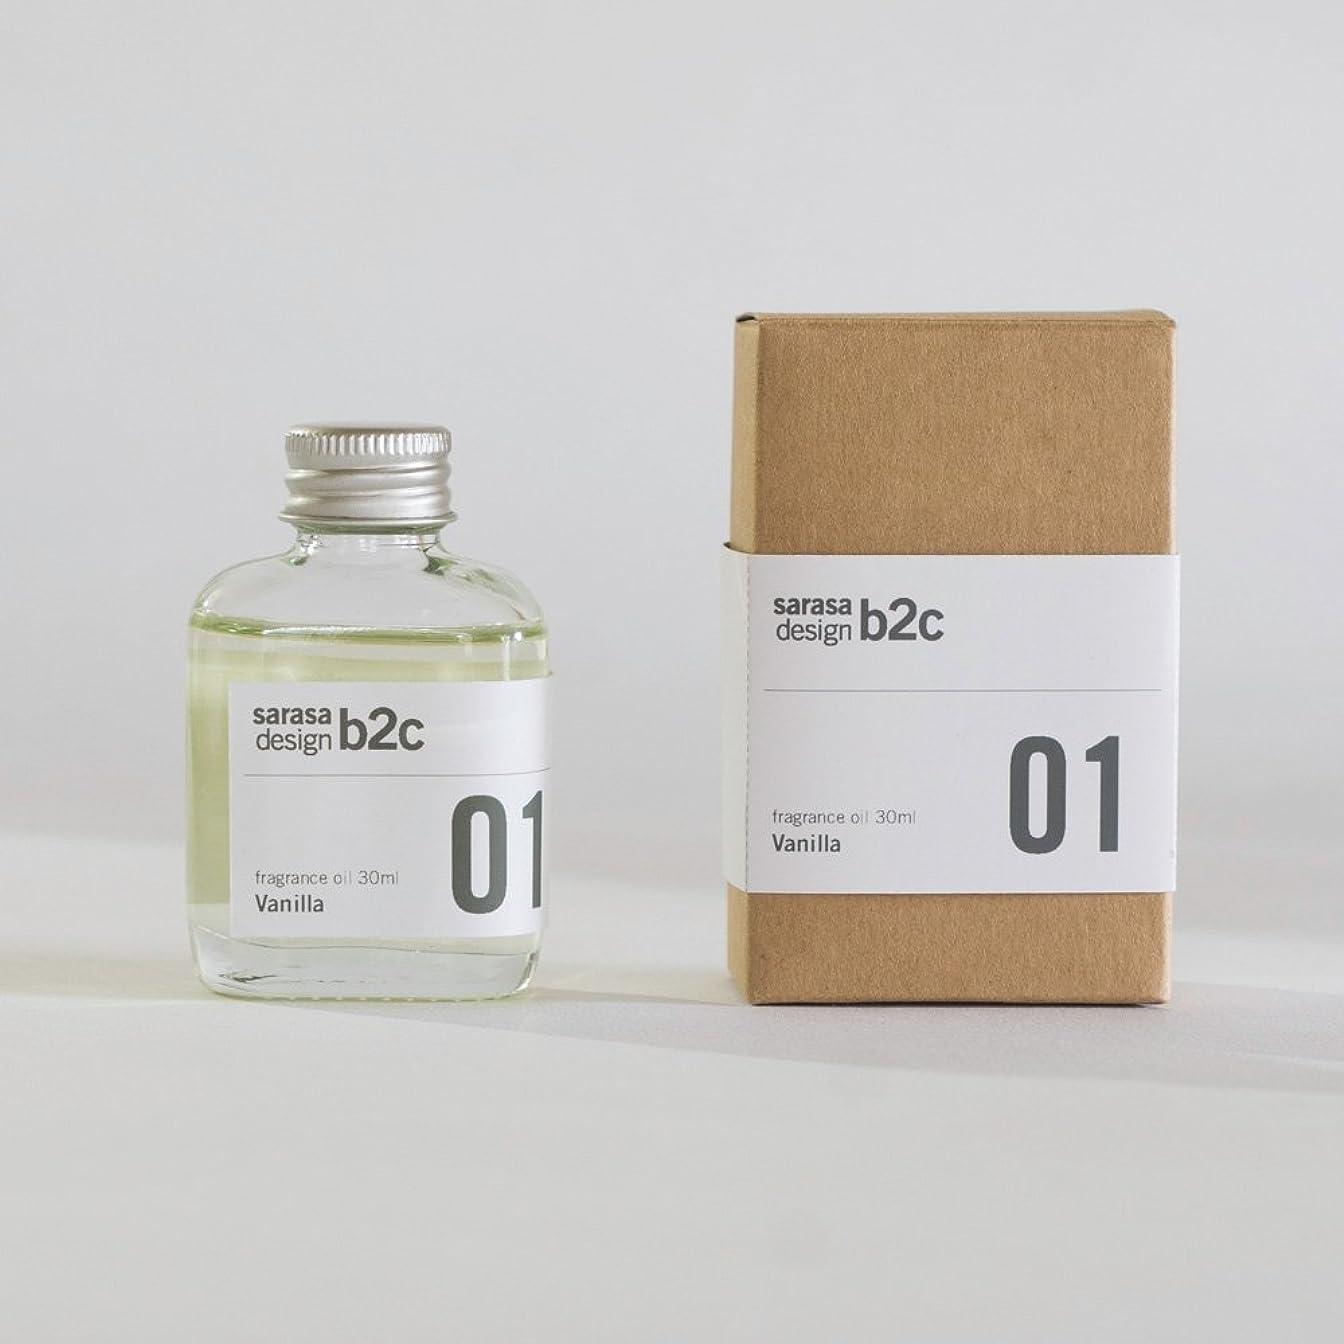 ar002md/b2c フレグランスオイル30ml《マンダリン》  芳香剤 ルームフレグランス リードディフューザー アロマ ディフューザー